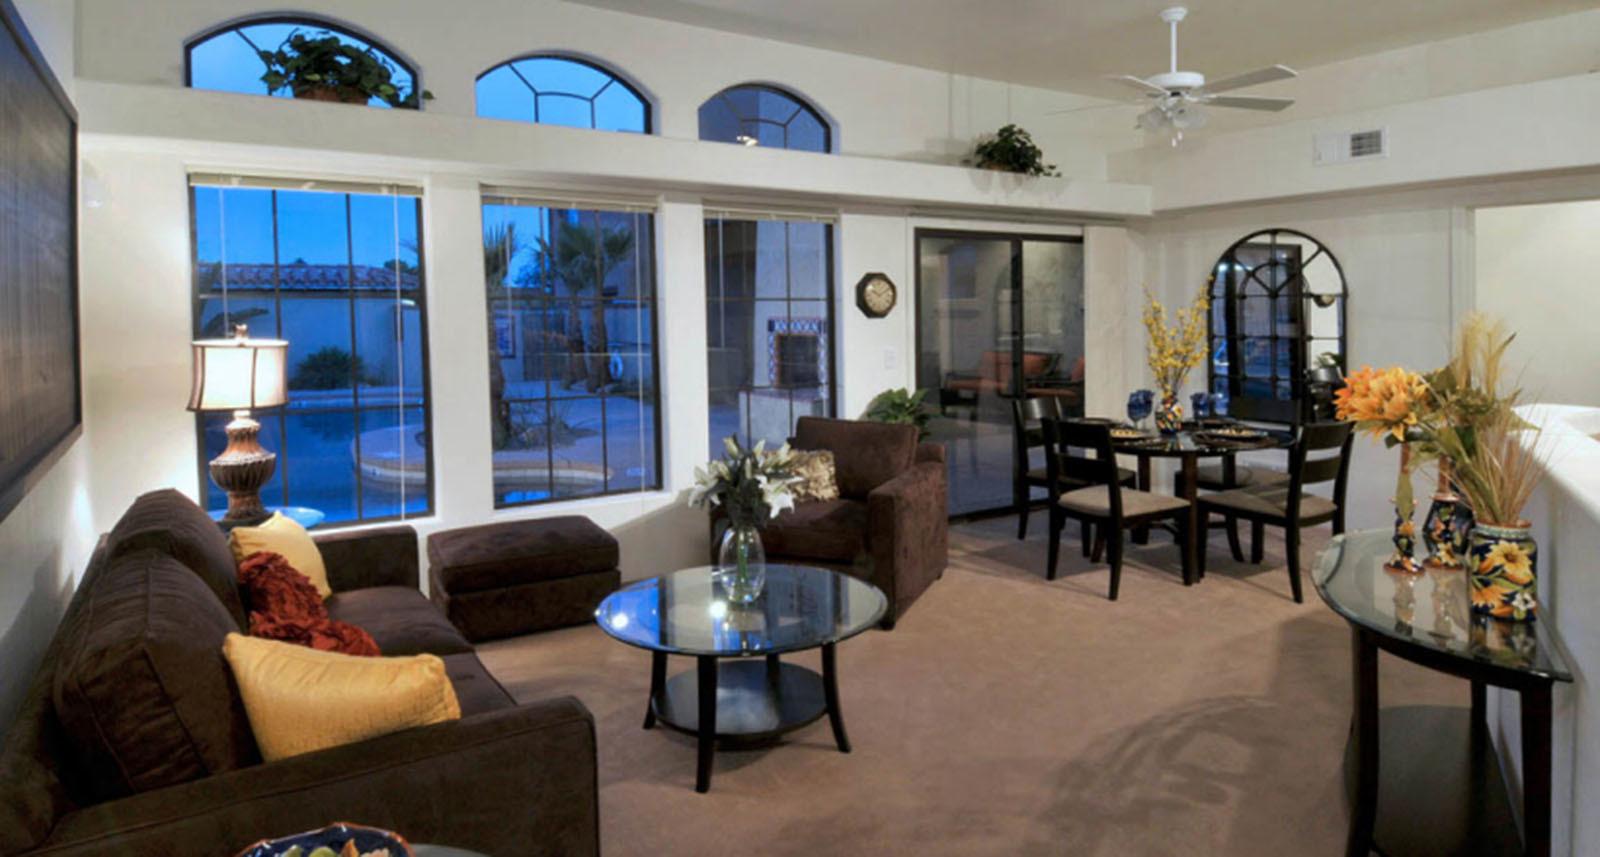 Tucson Rental Homes And Apartments In Tucson Az 520 299 4